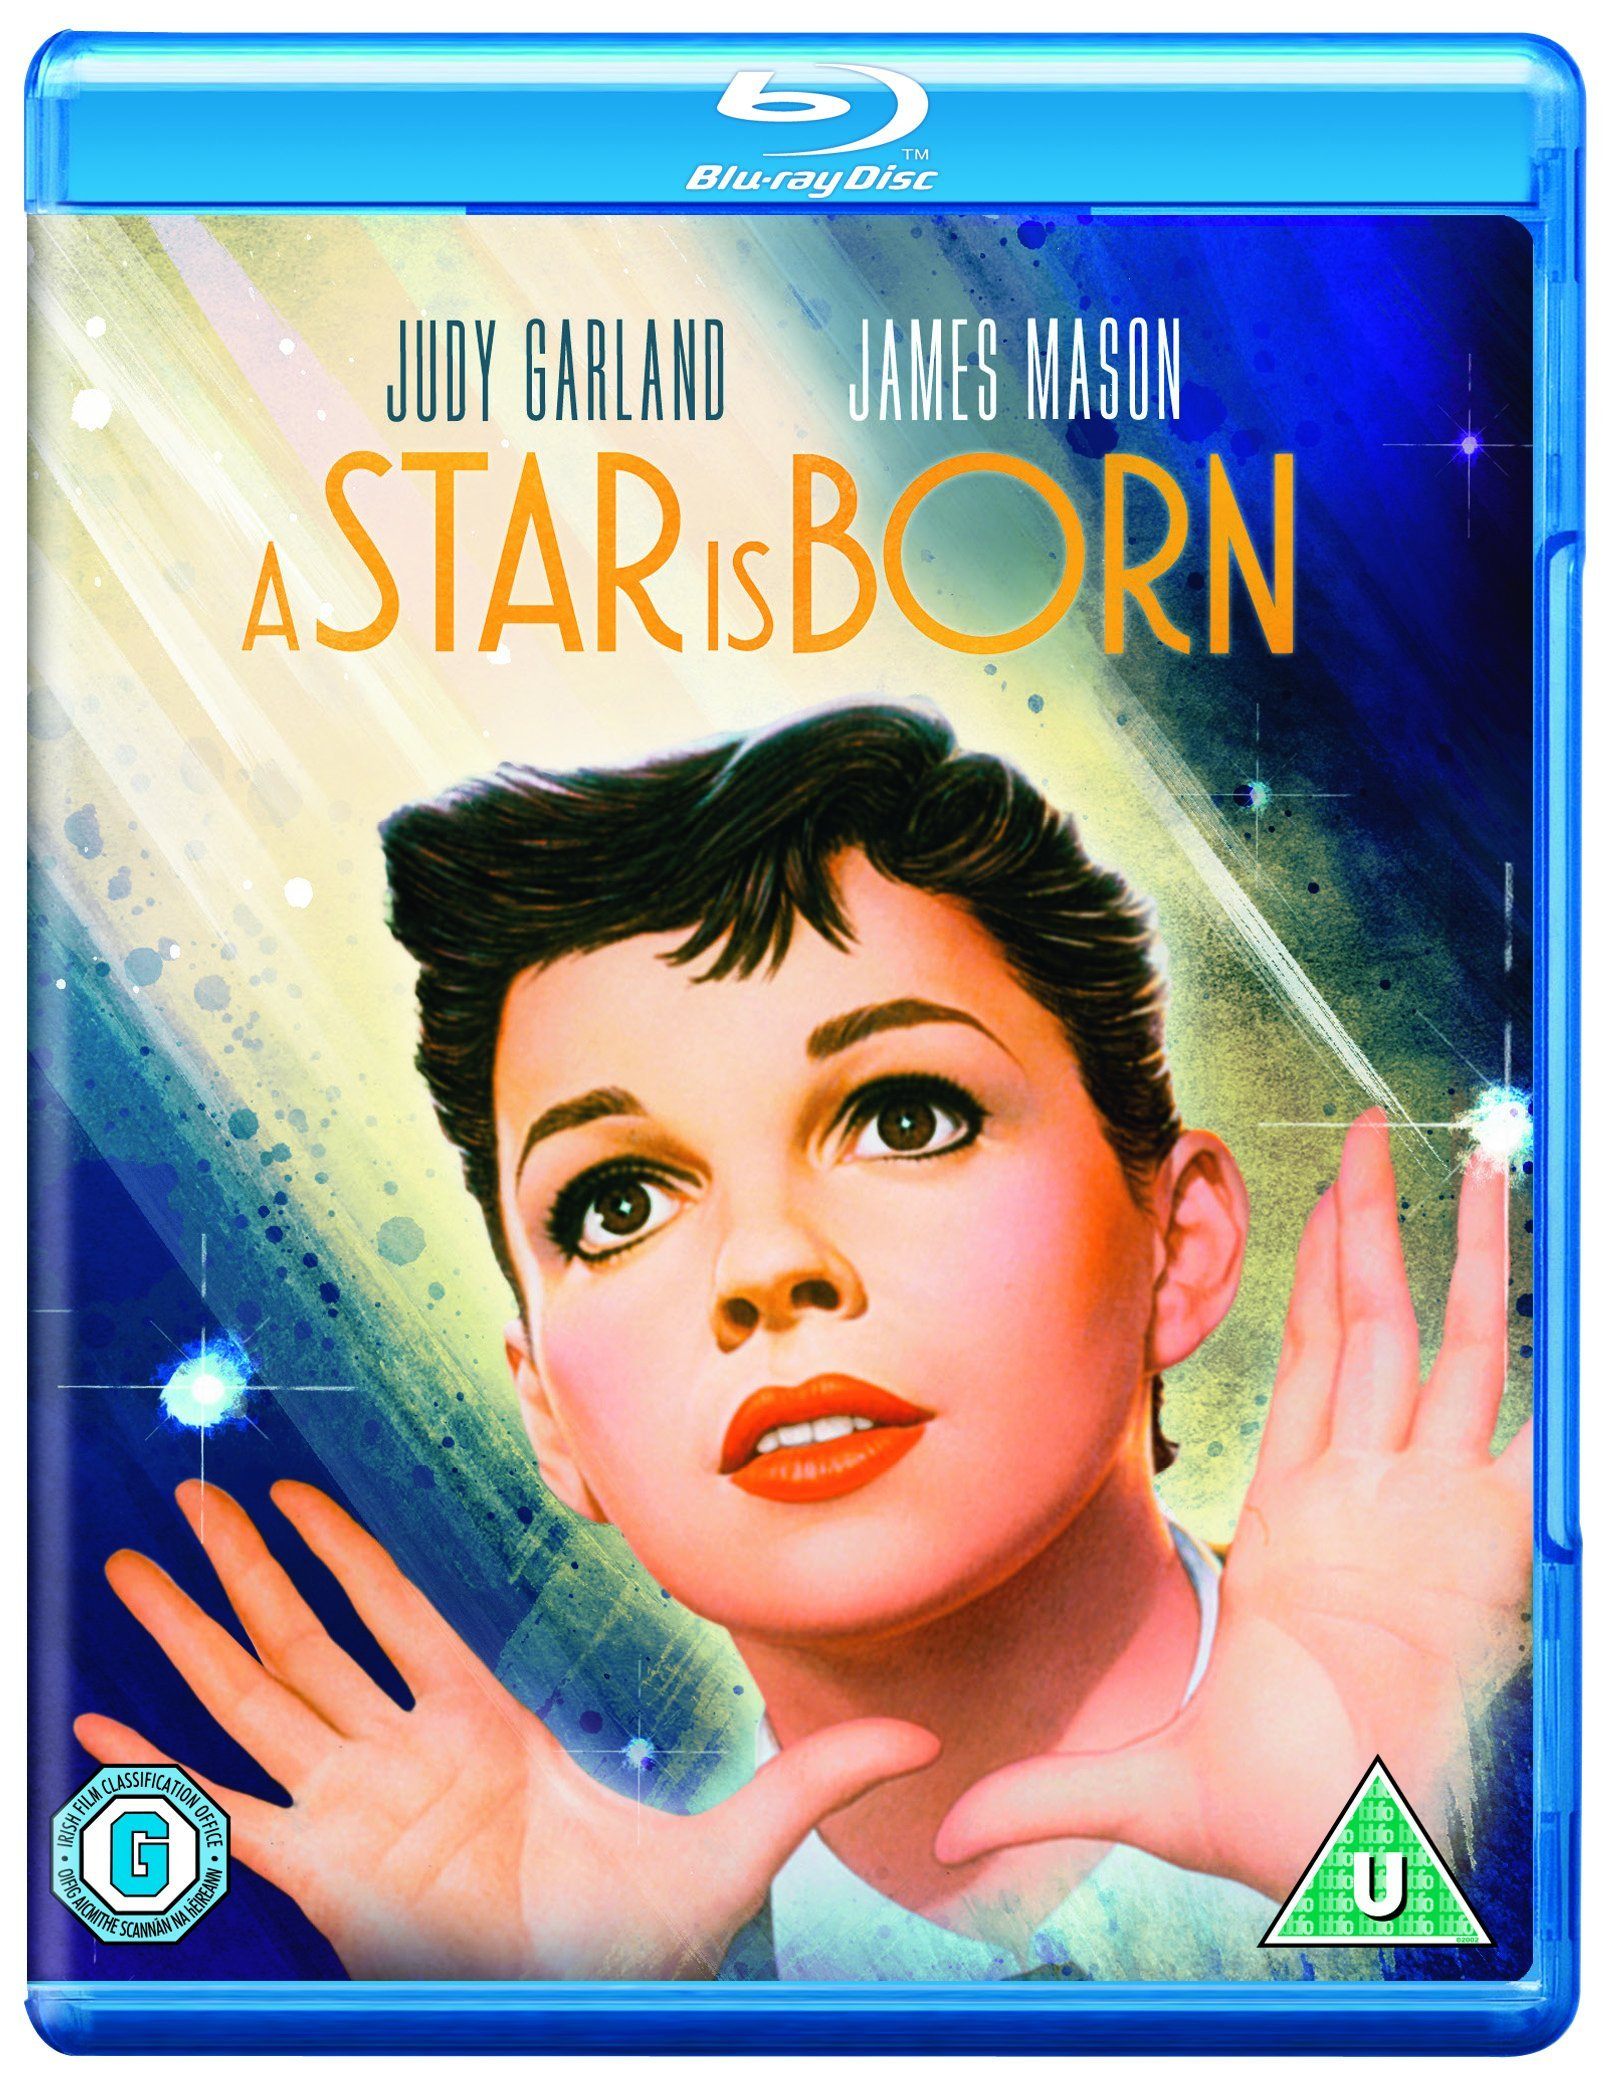 Buy Star Born Now!